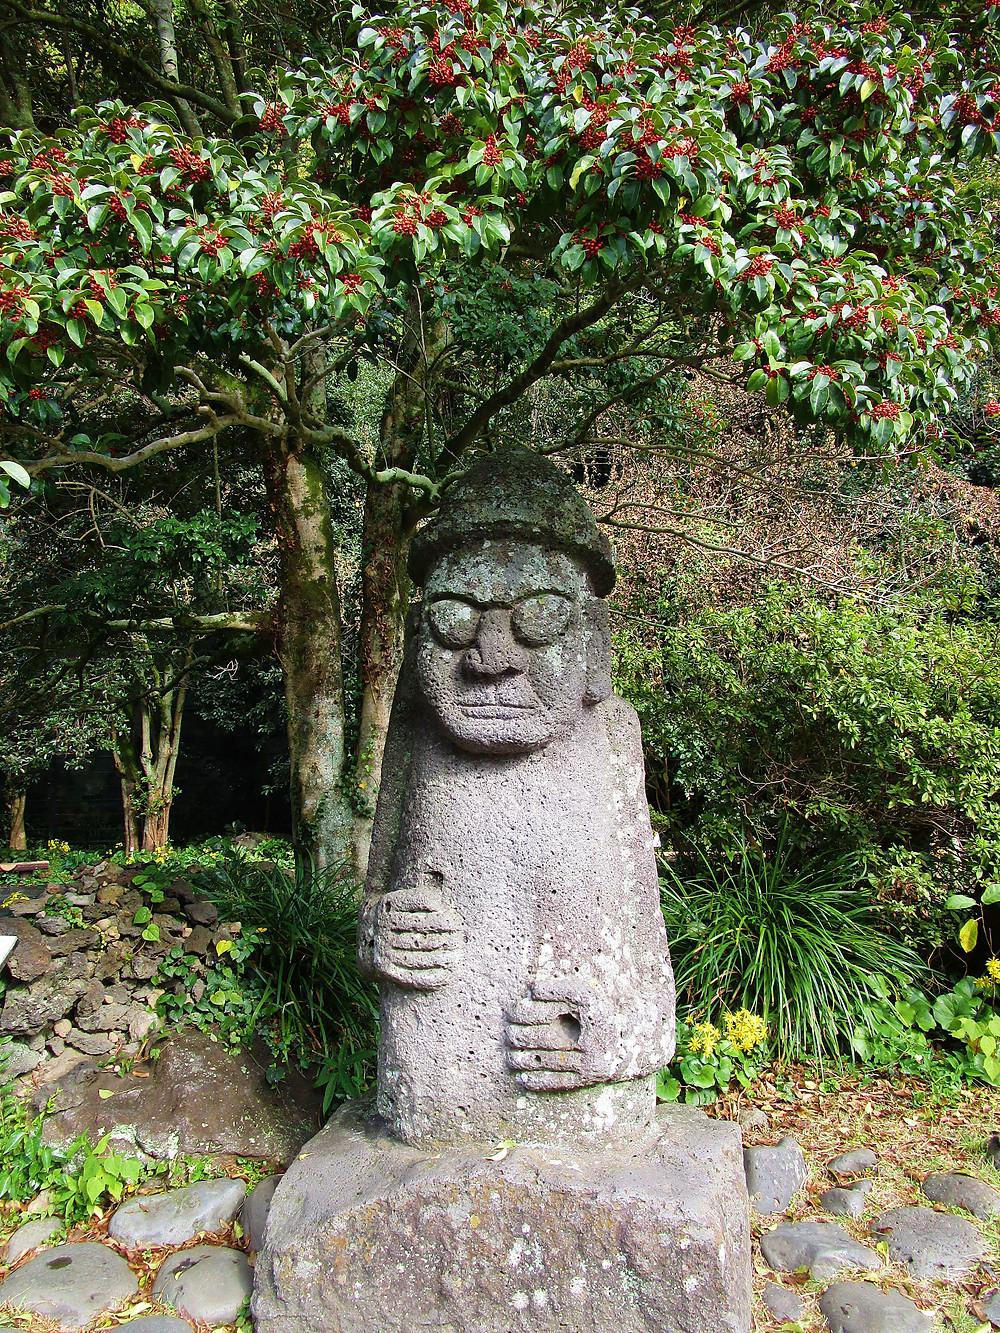 Jeju Statue in Cheongjiyeon Waterfall Park